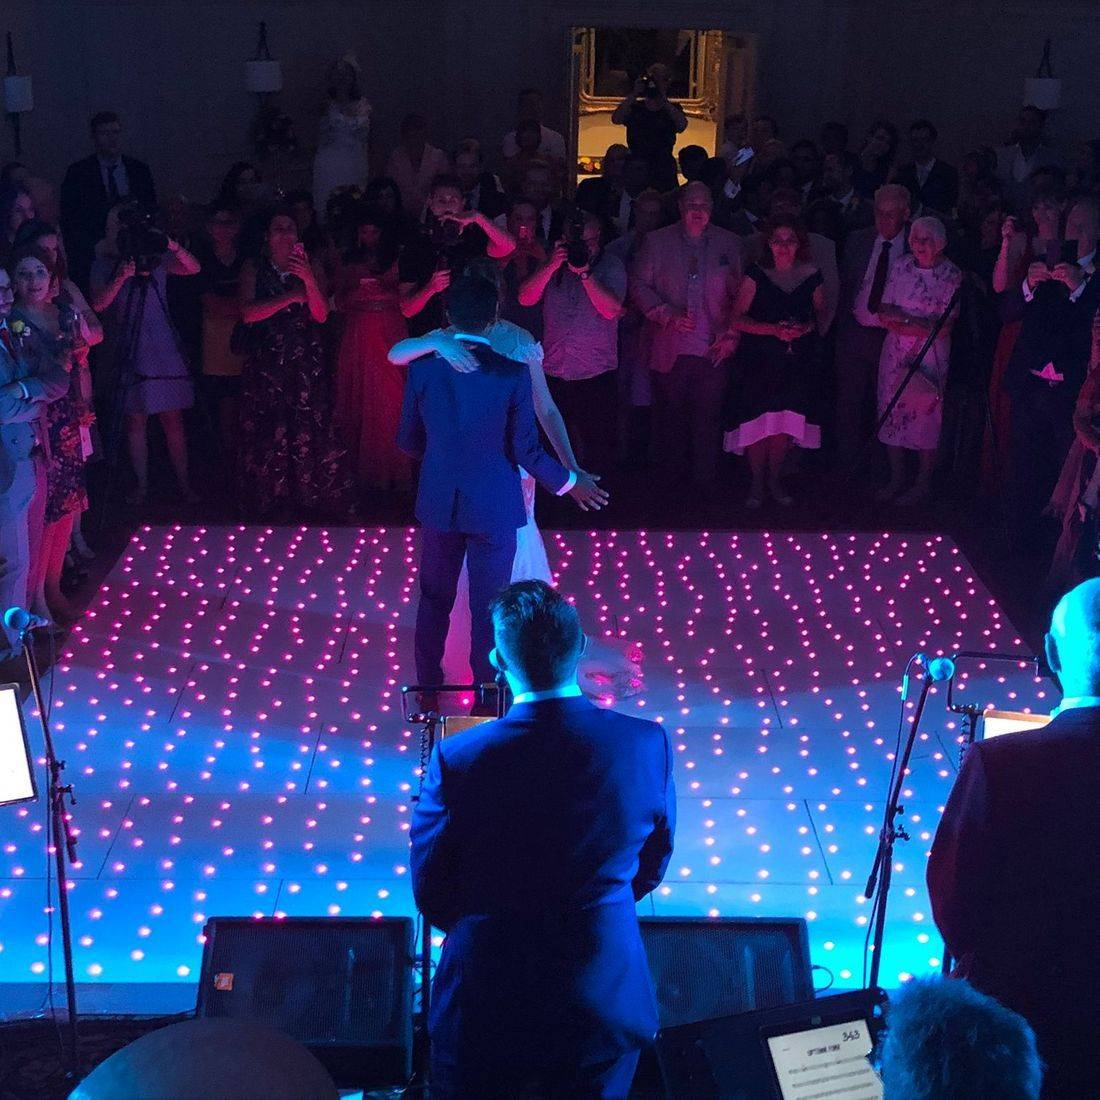 Stanbrook Abbey  #Worcesterhsire #wedding #dj #weddingentertainment  #leddancefloor